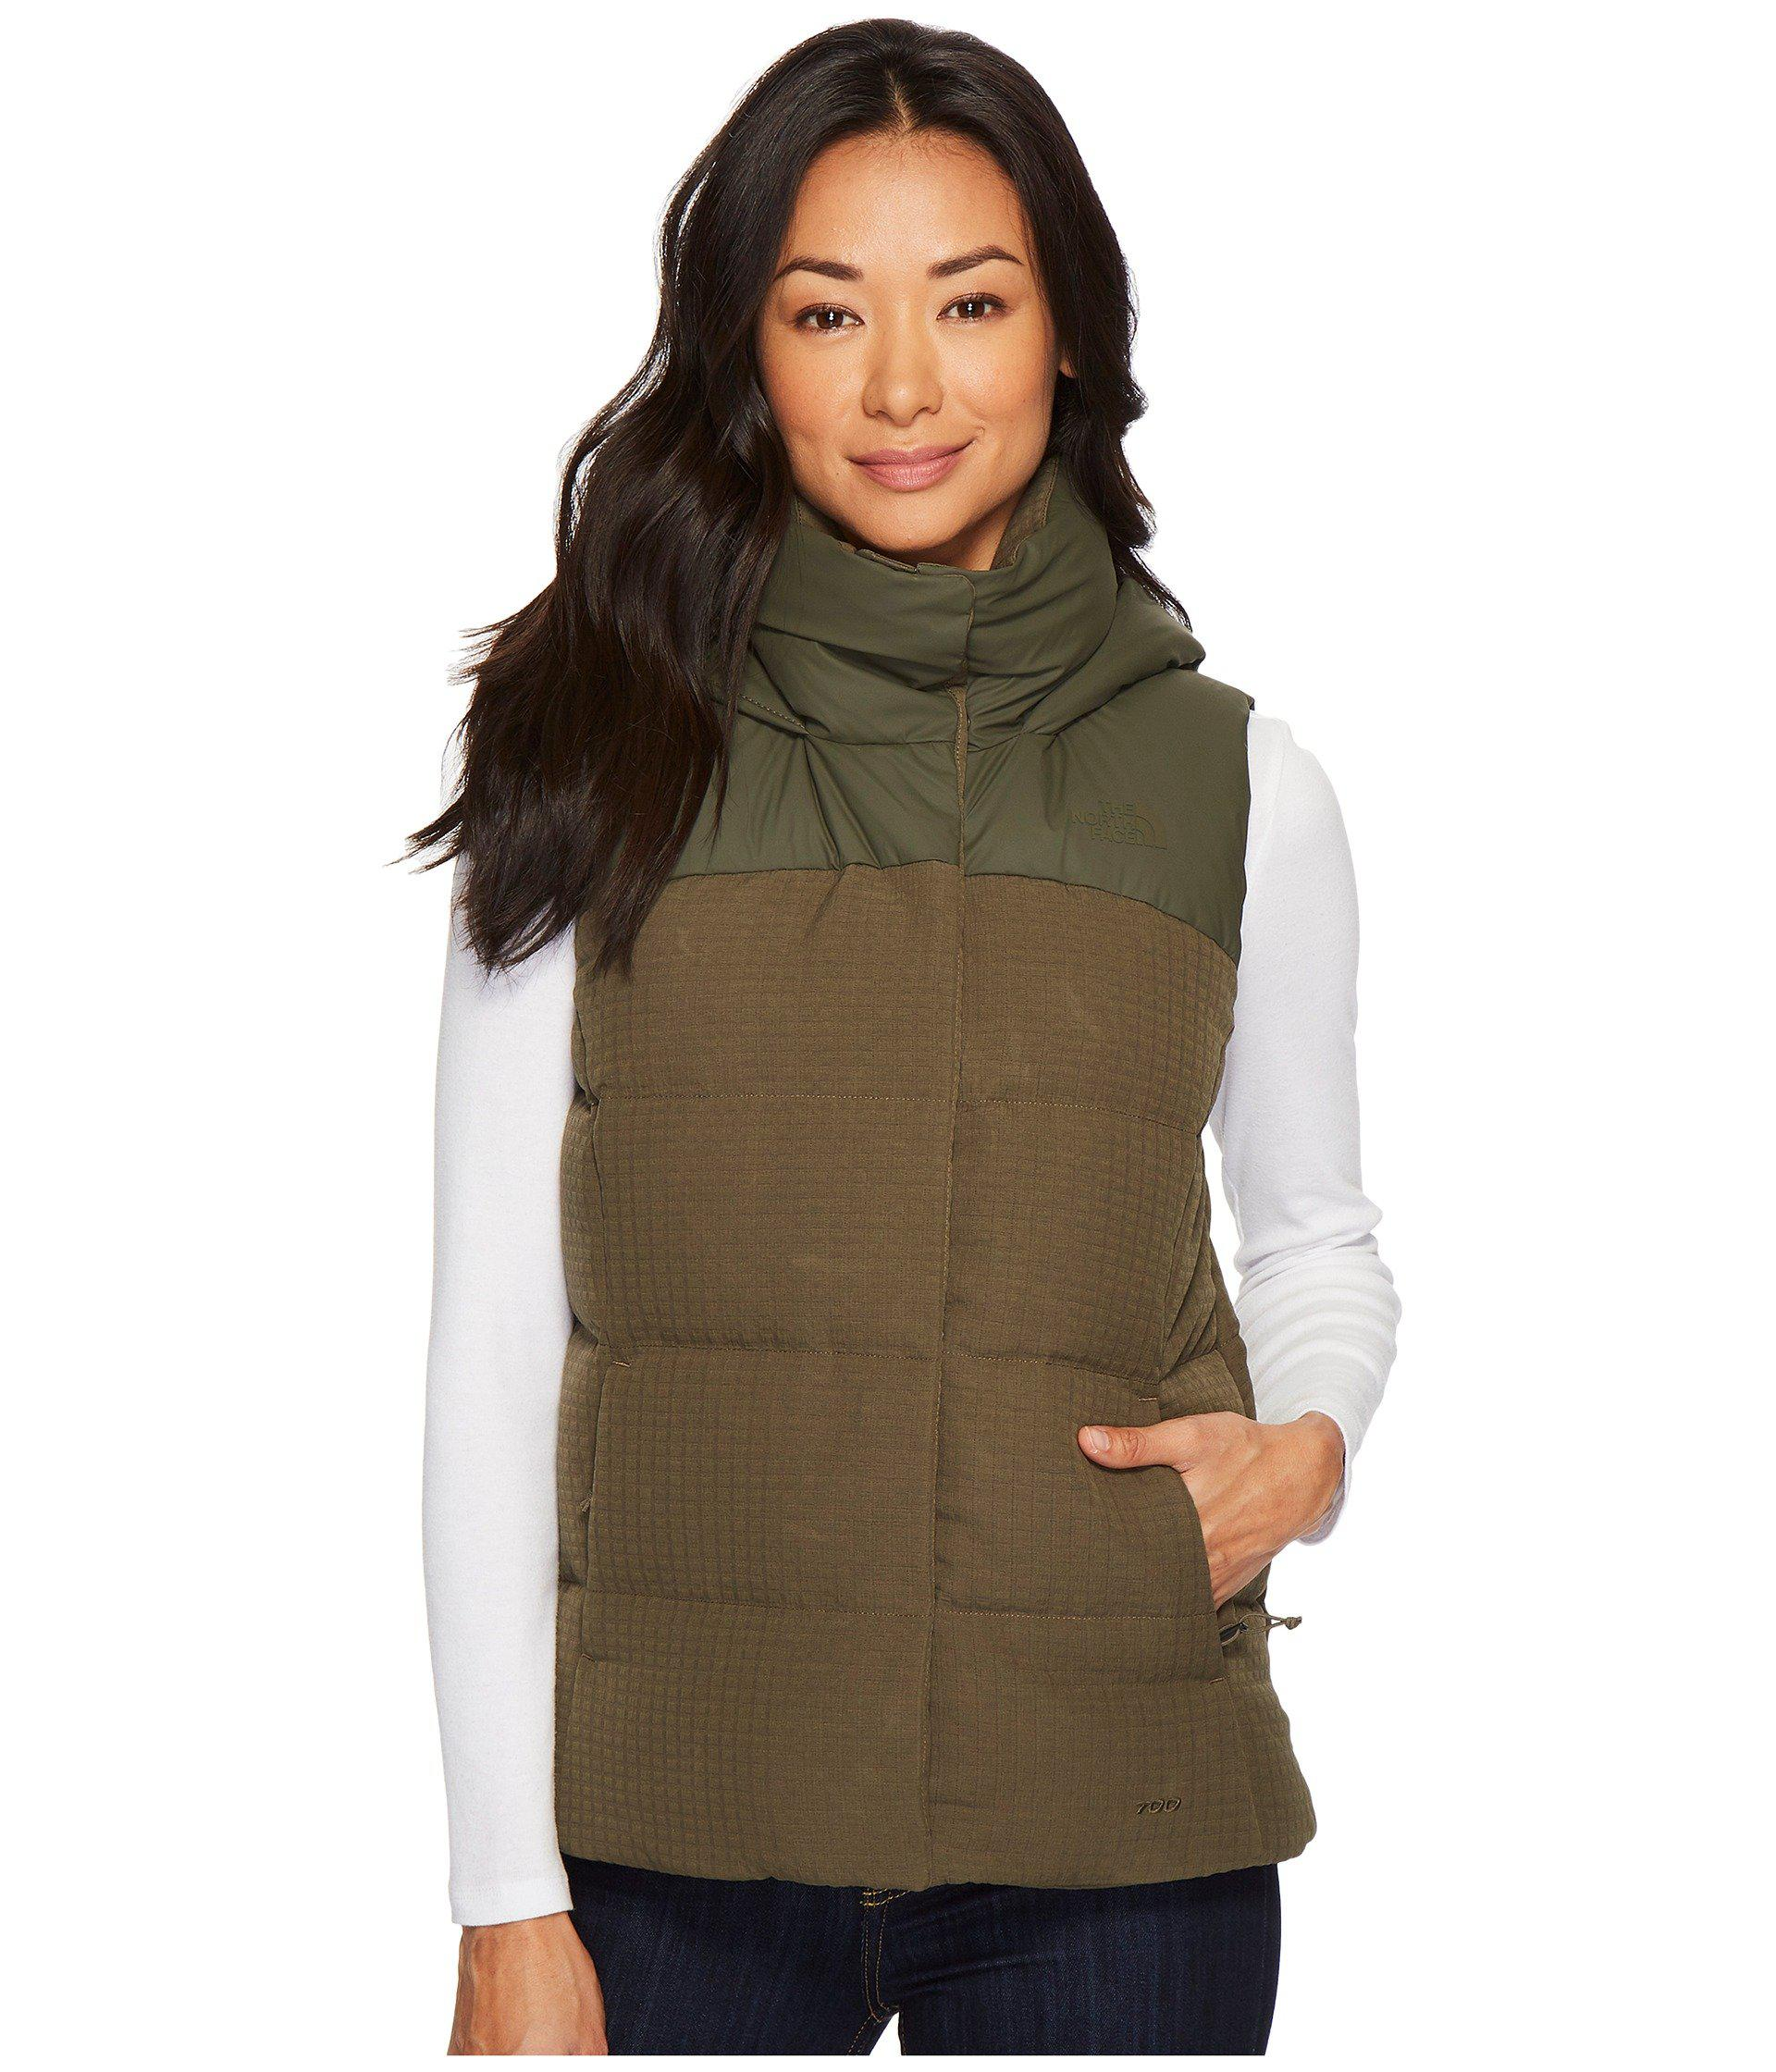 7c979d518 Women's Green Novelty Nuptse Vest